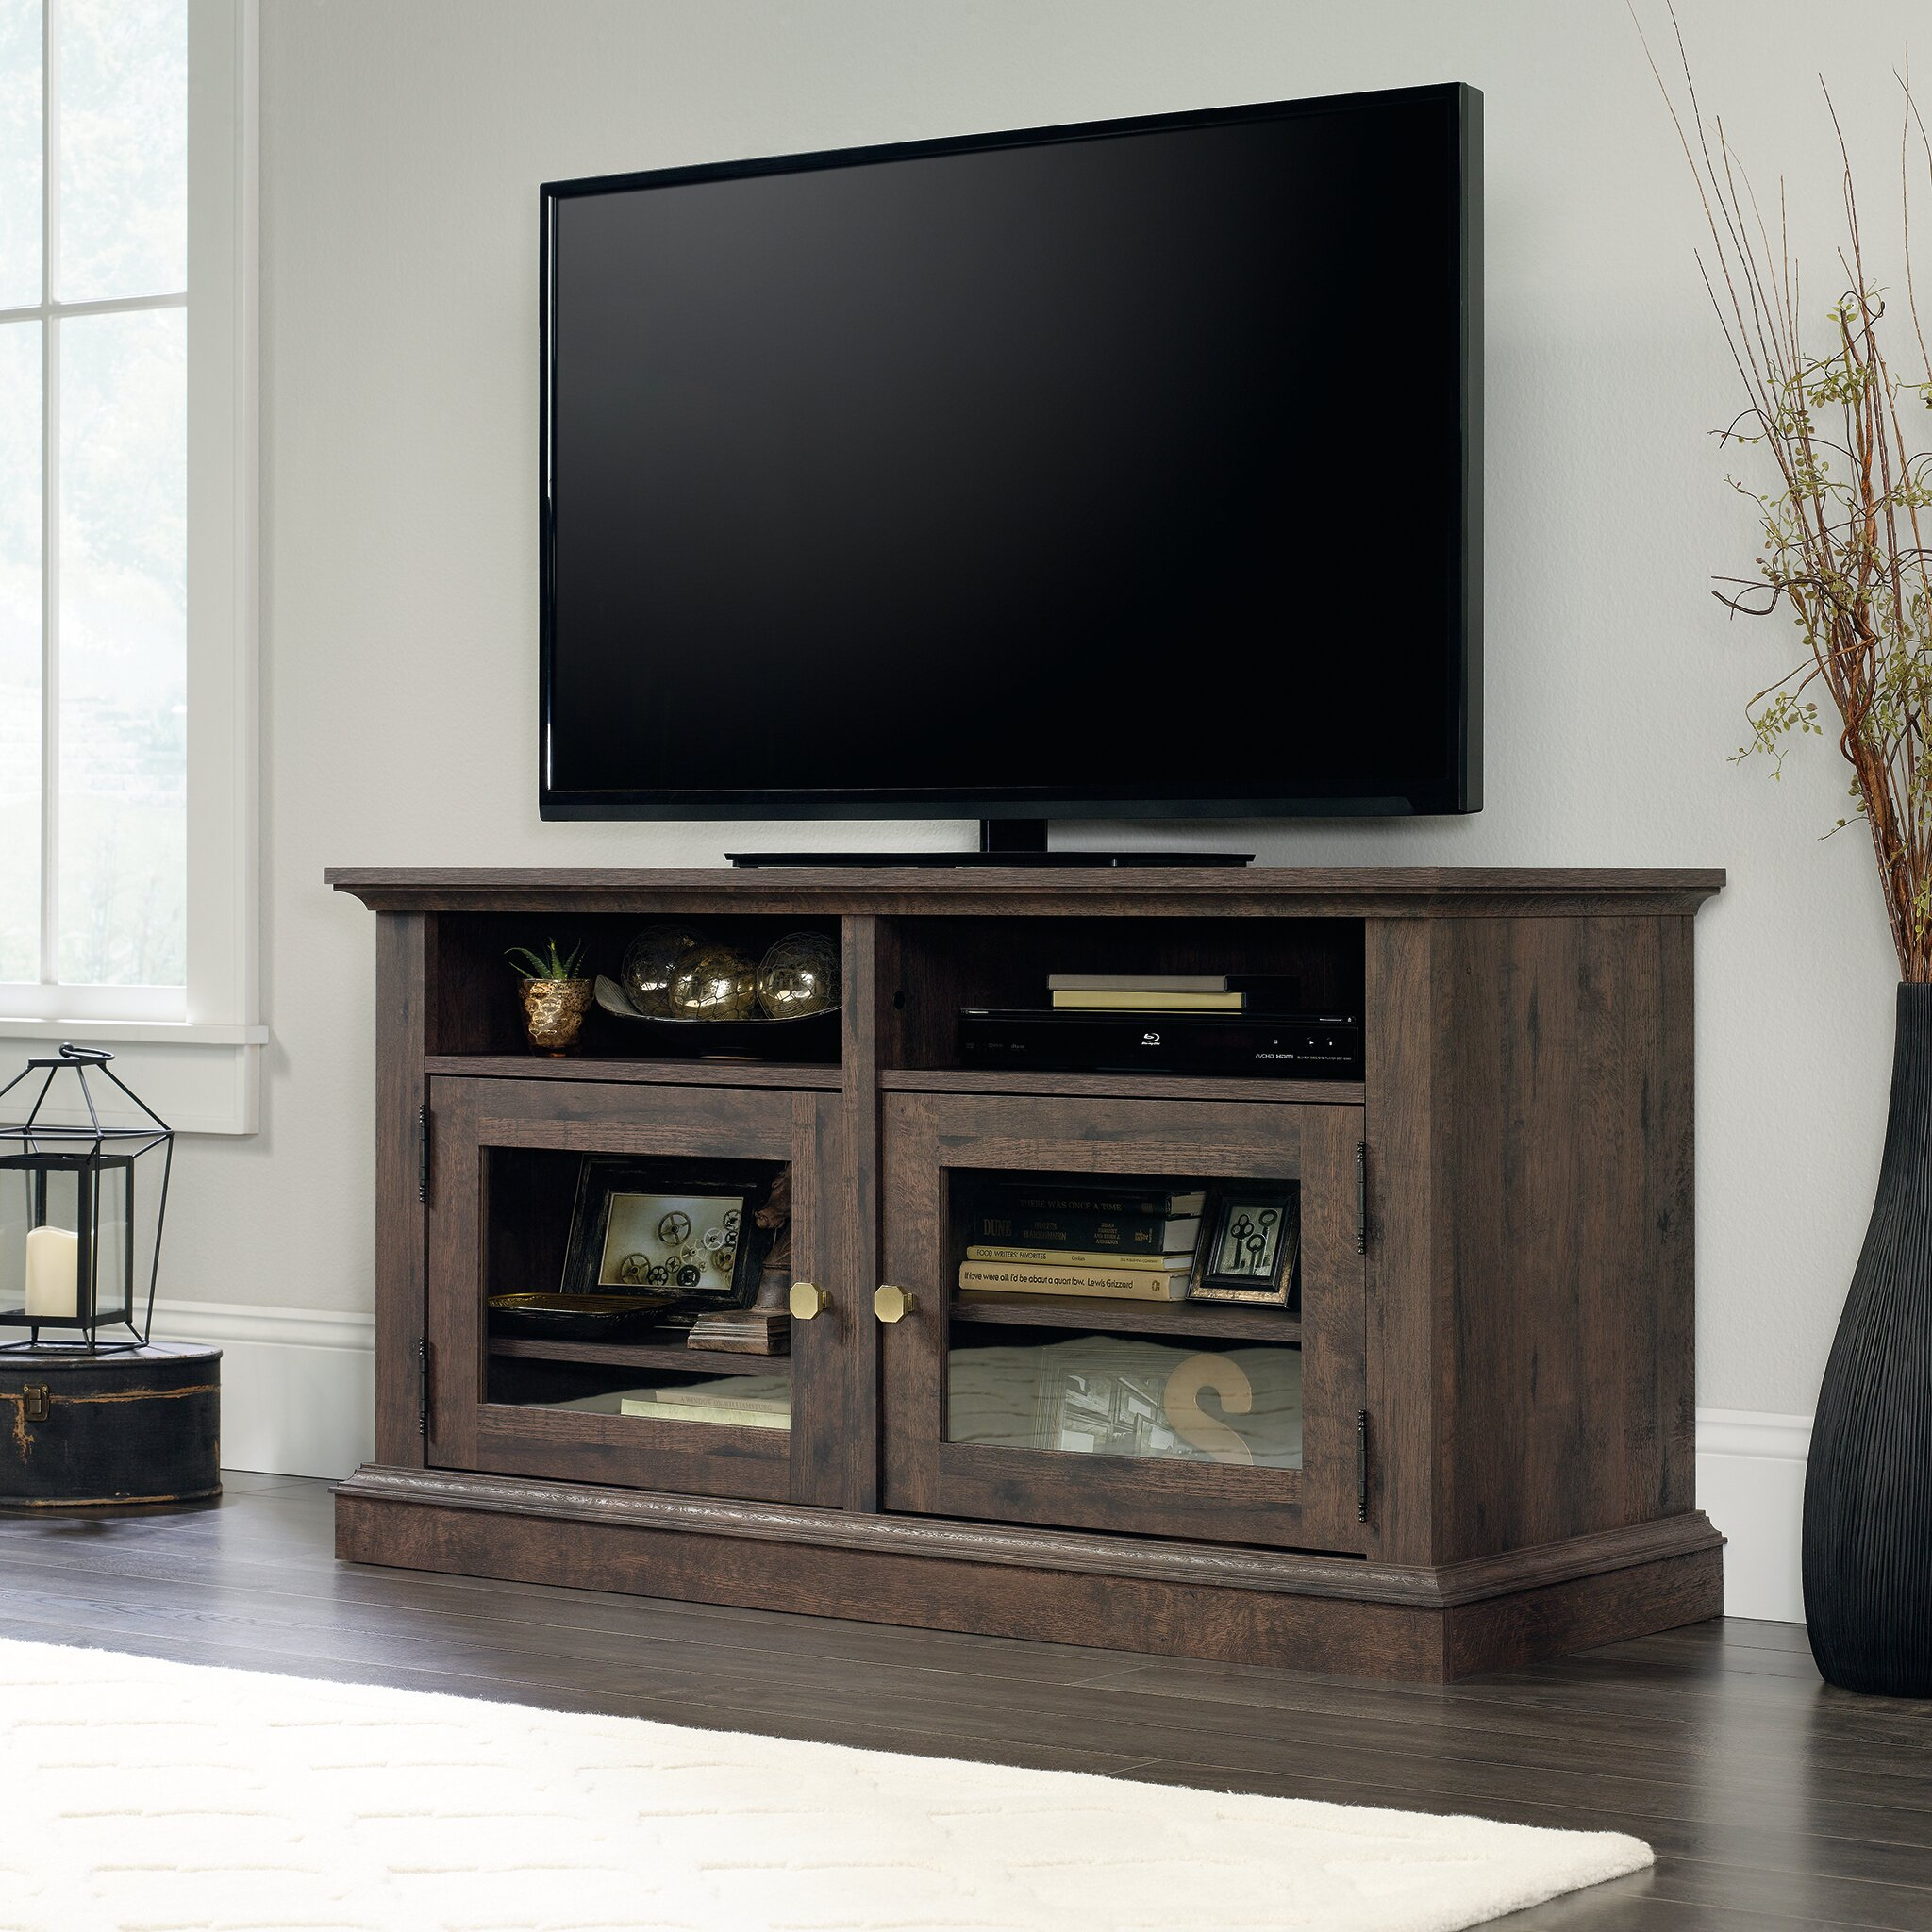 Laurel foundry modern farmhouse arvilla tv stand reviews - Laurel foundry modern farmhouse bedroom ...